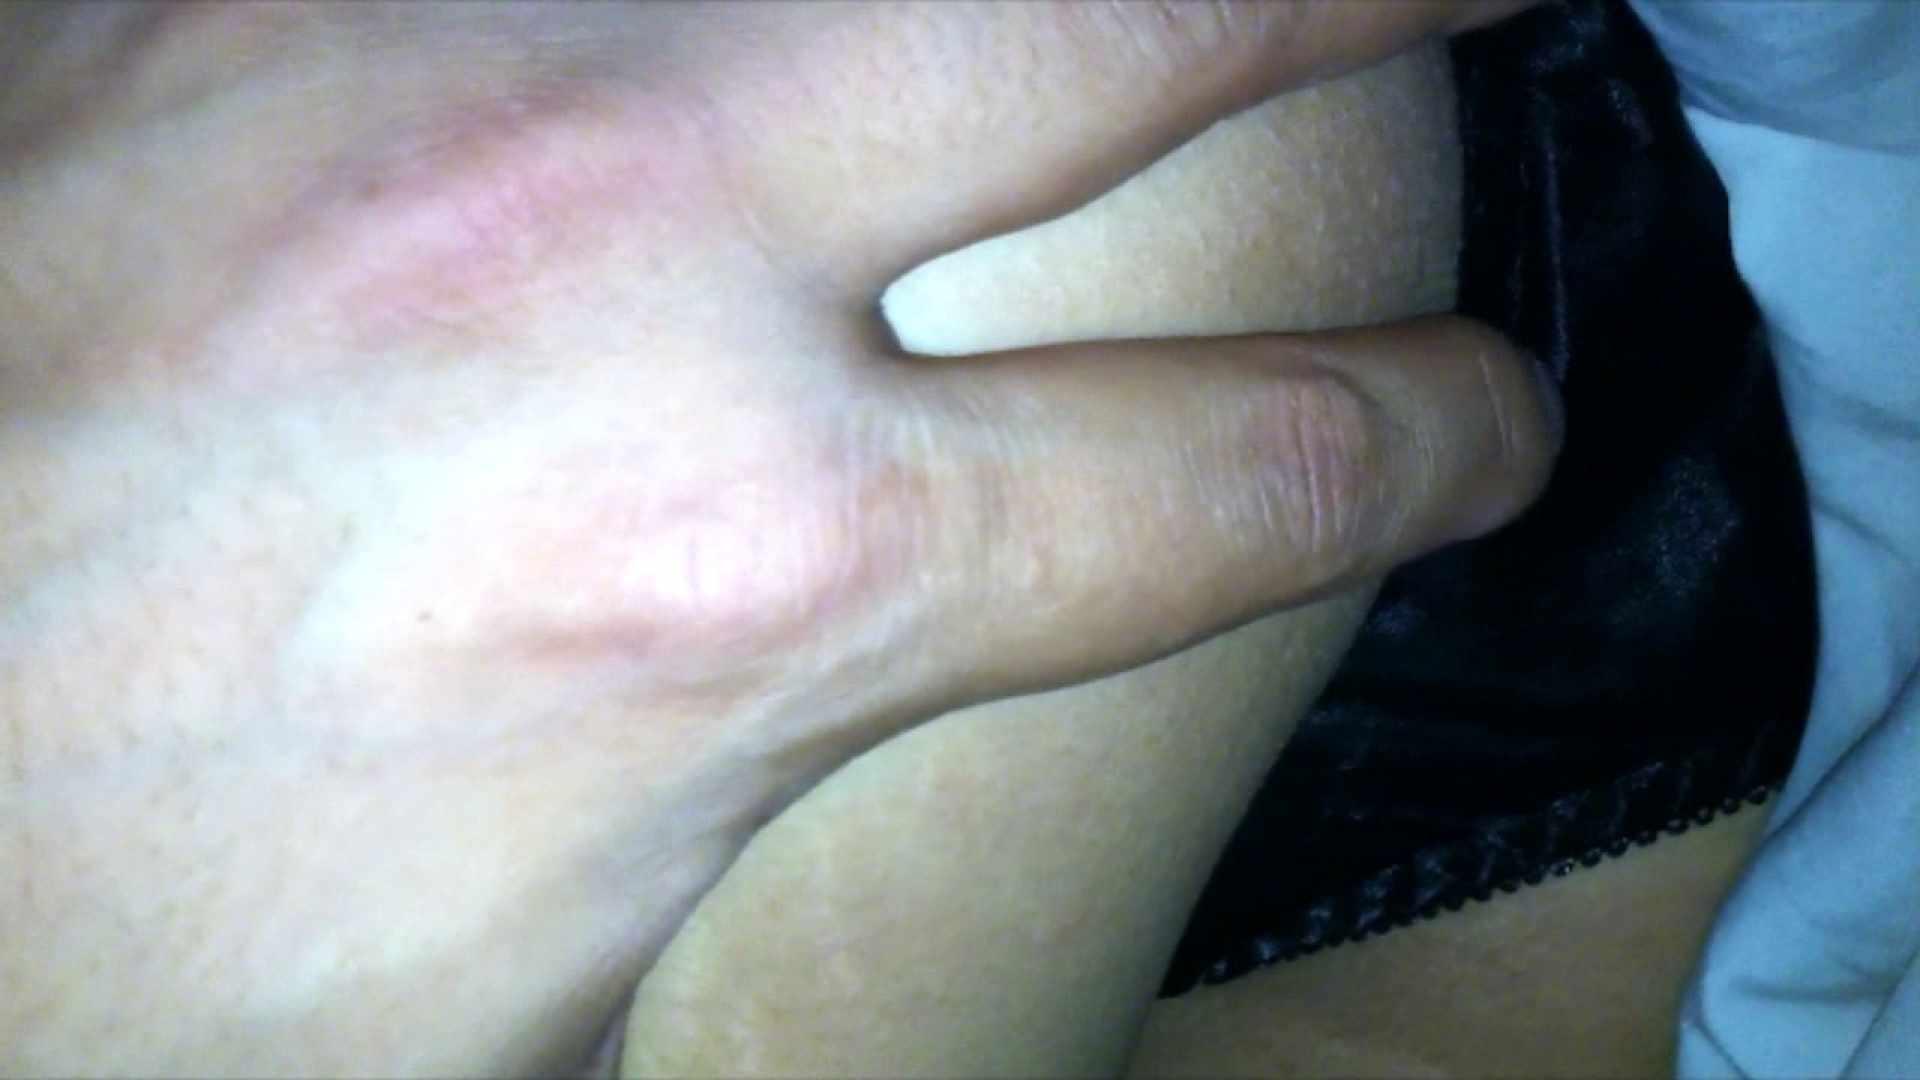 vol.17 【NSちゃん】エステティシャン23歳 愛液が滲む 女子大生 エロ画像 105枚 93